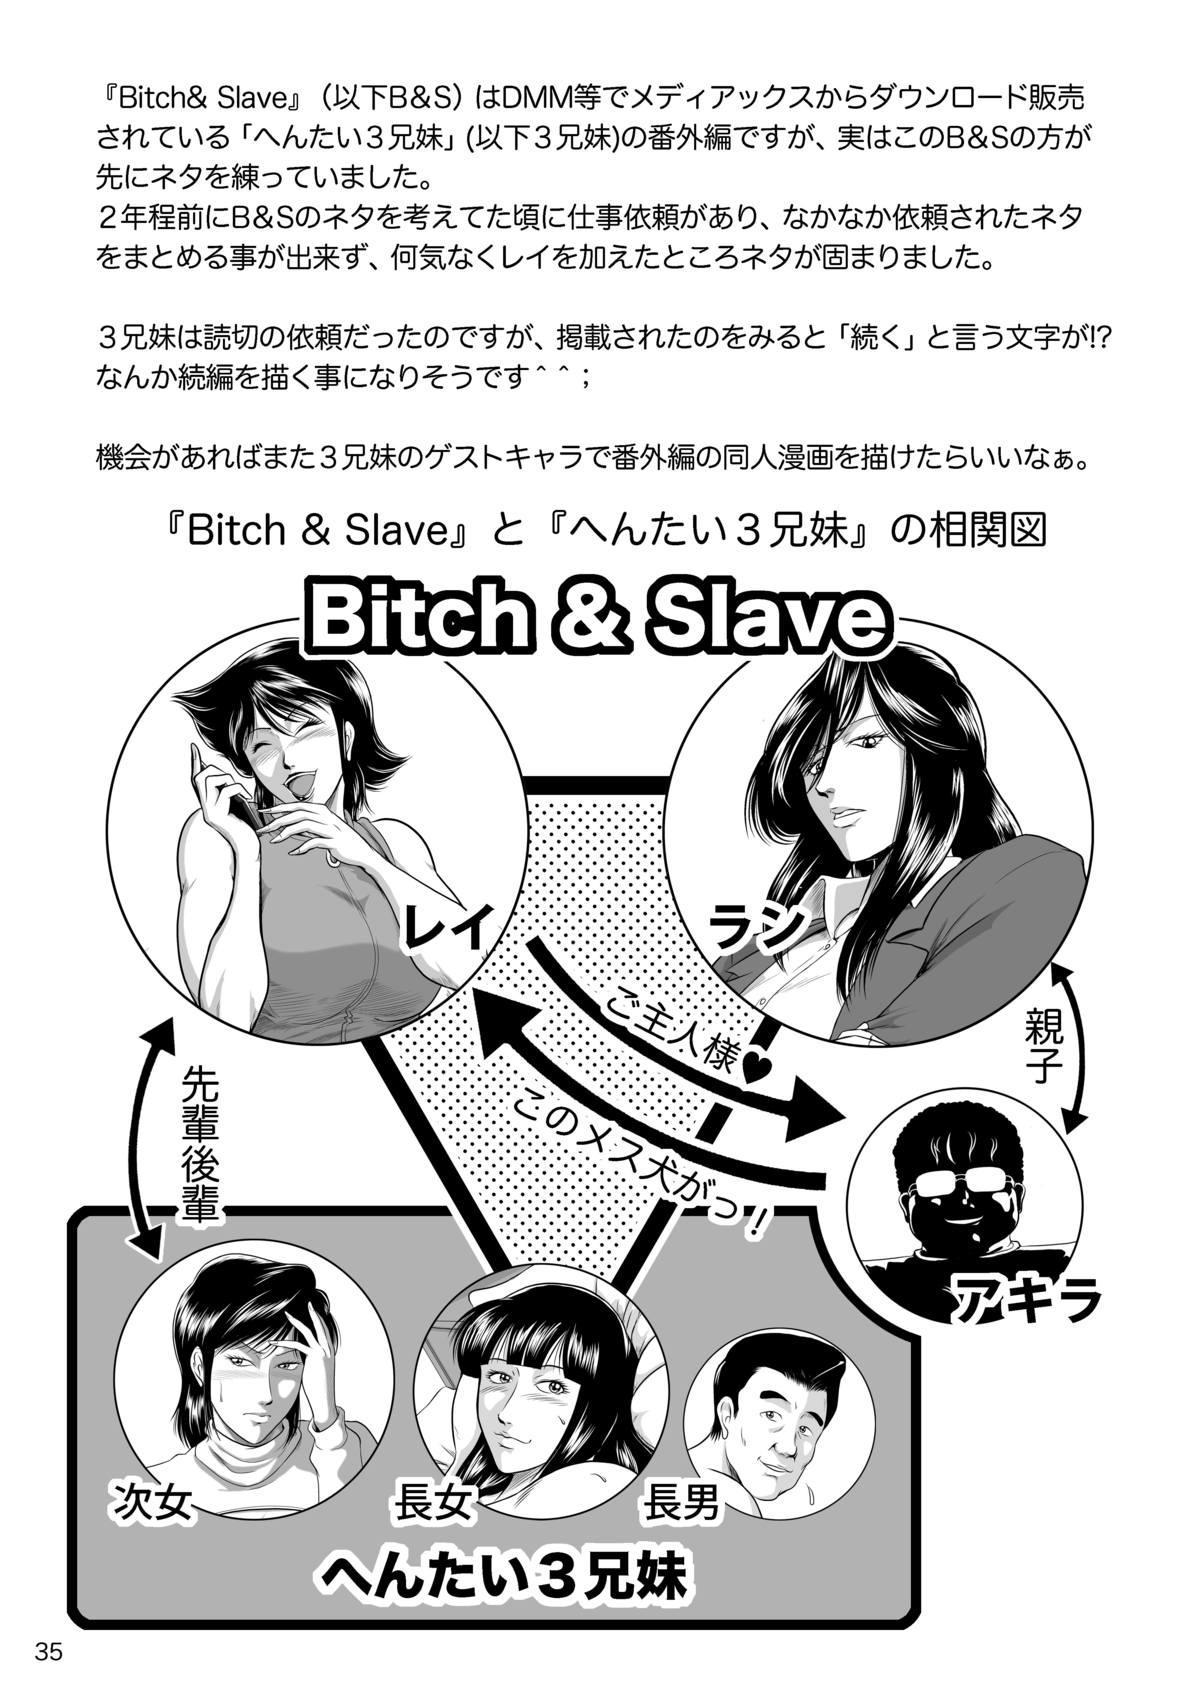 Bitch & Slave 36